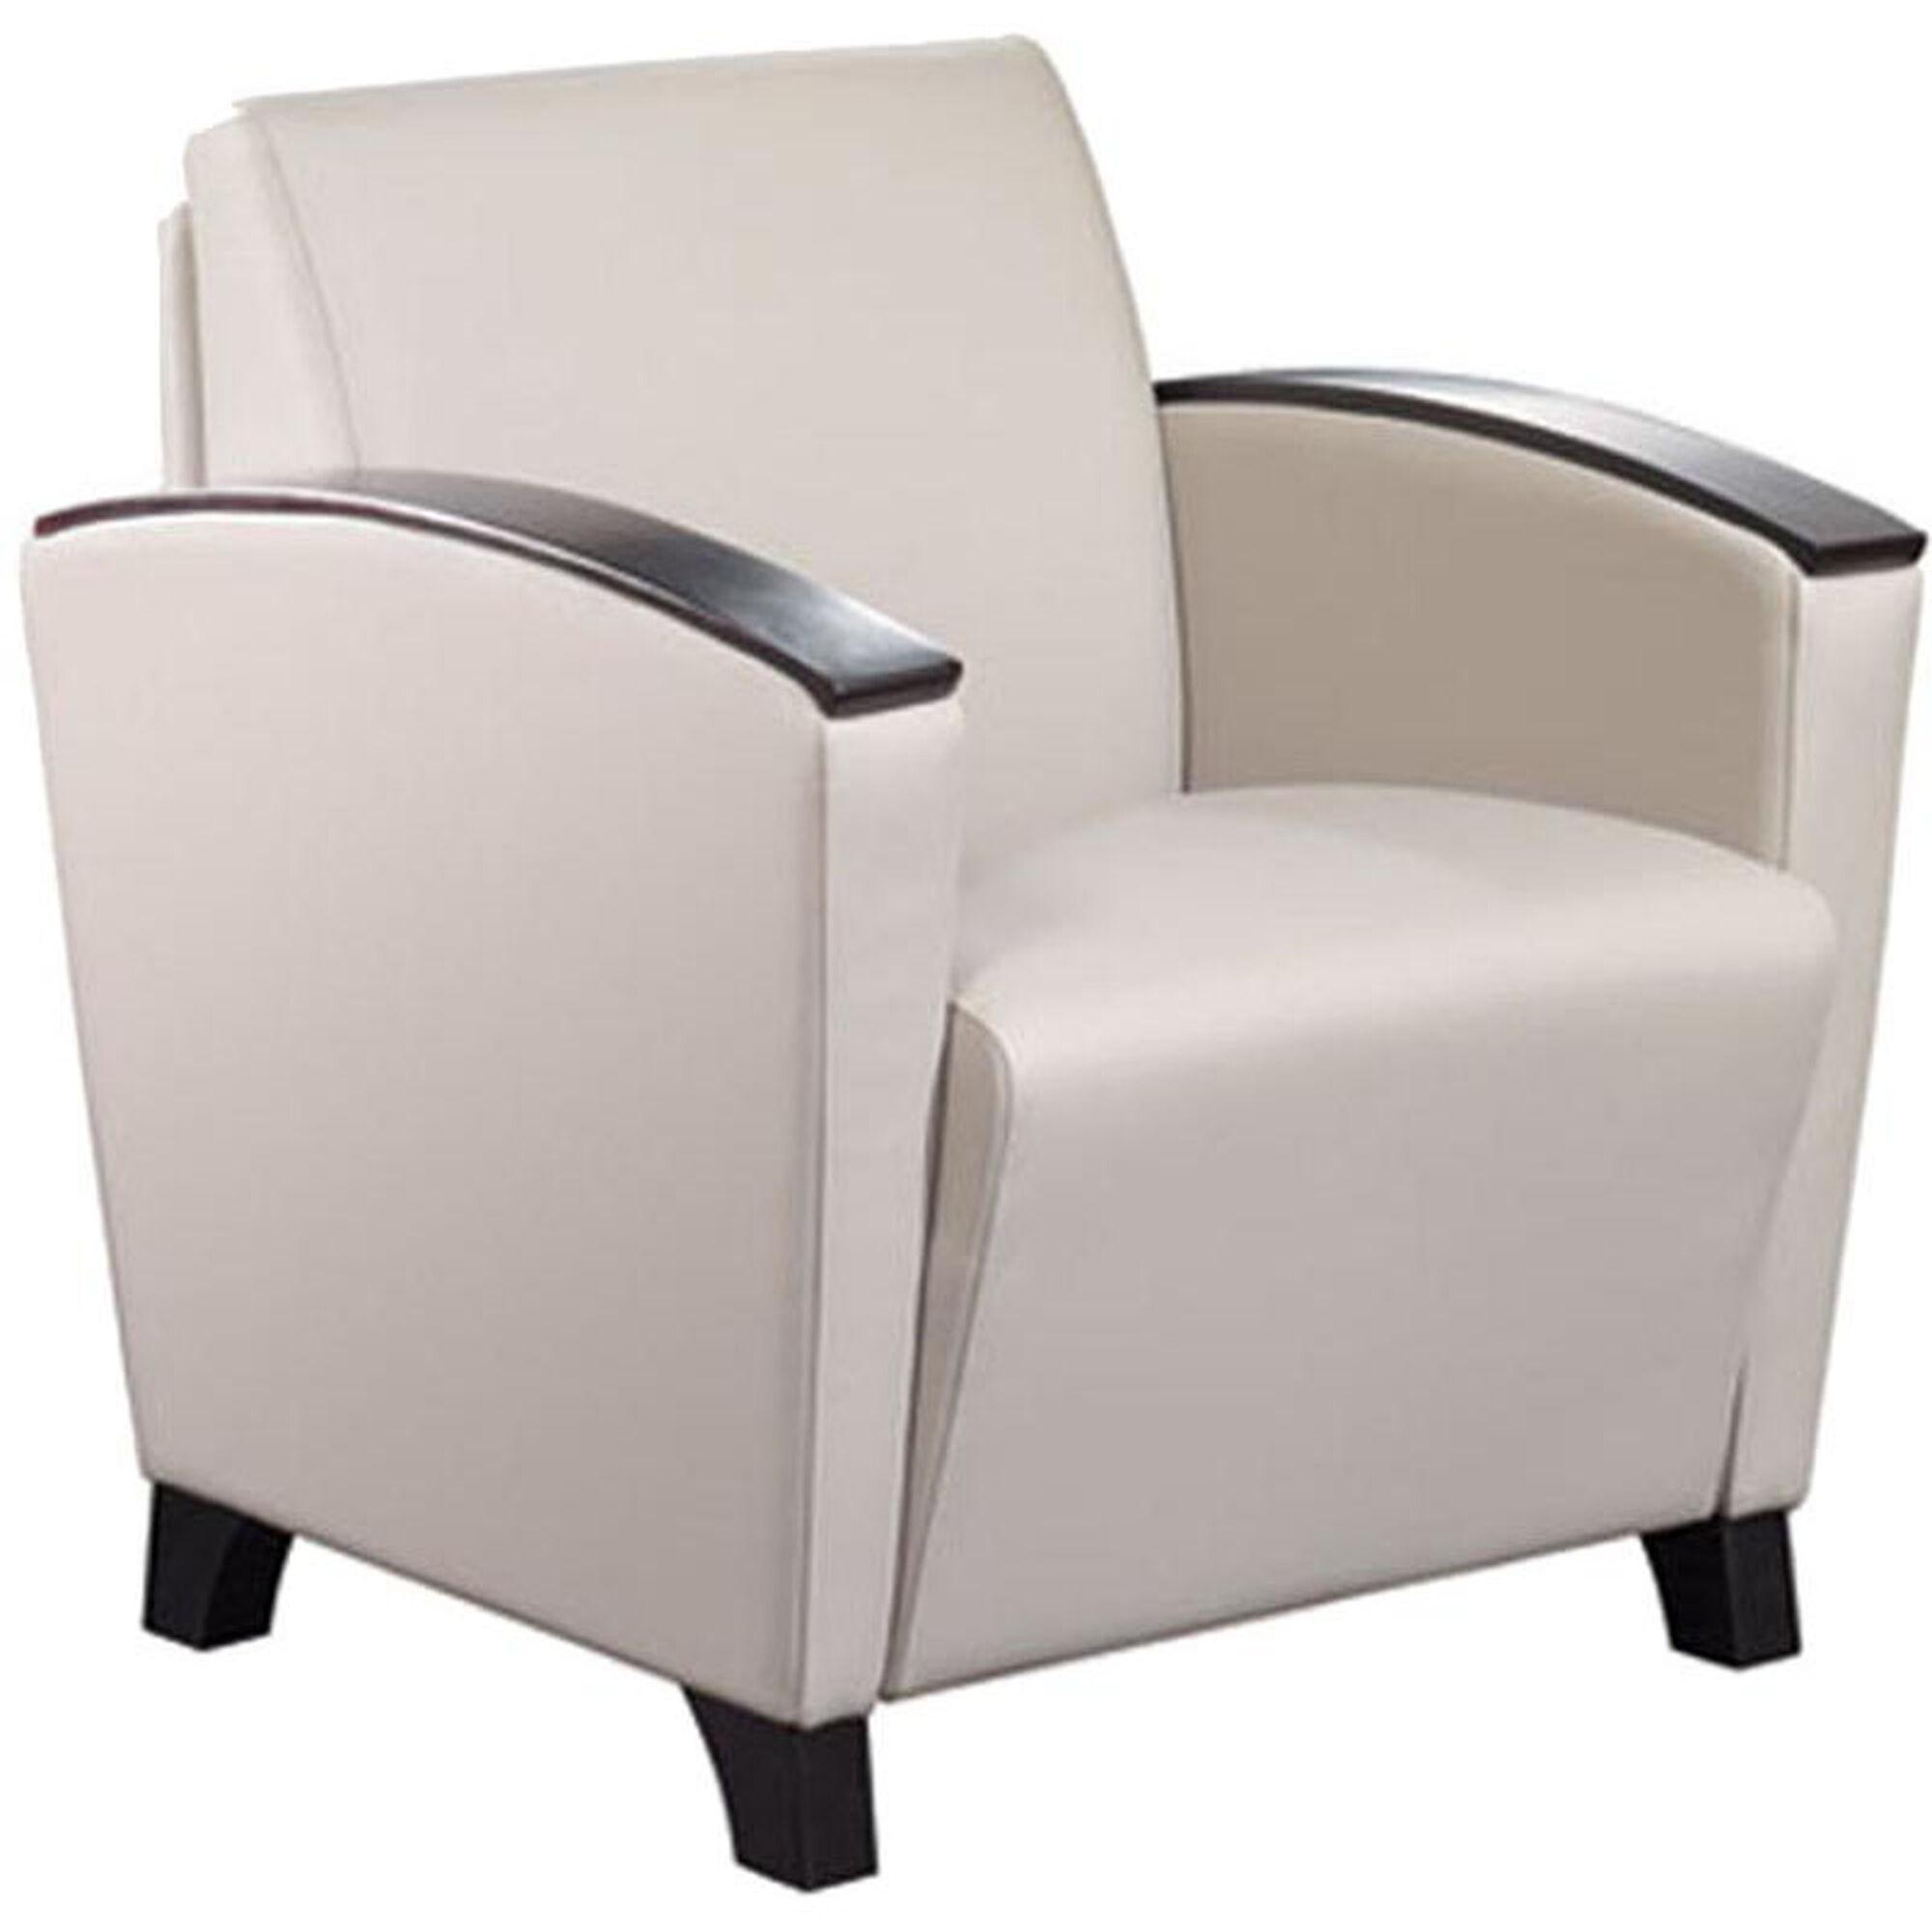 La z boy contract furniture dia10ac lzbf for Boys lounge chair